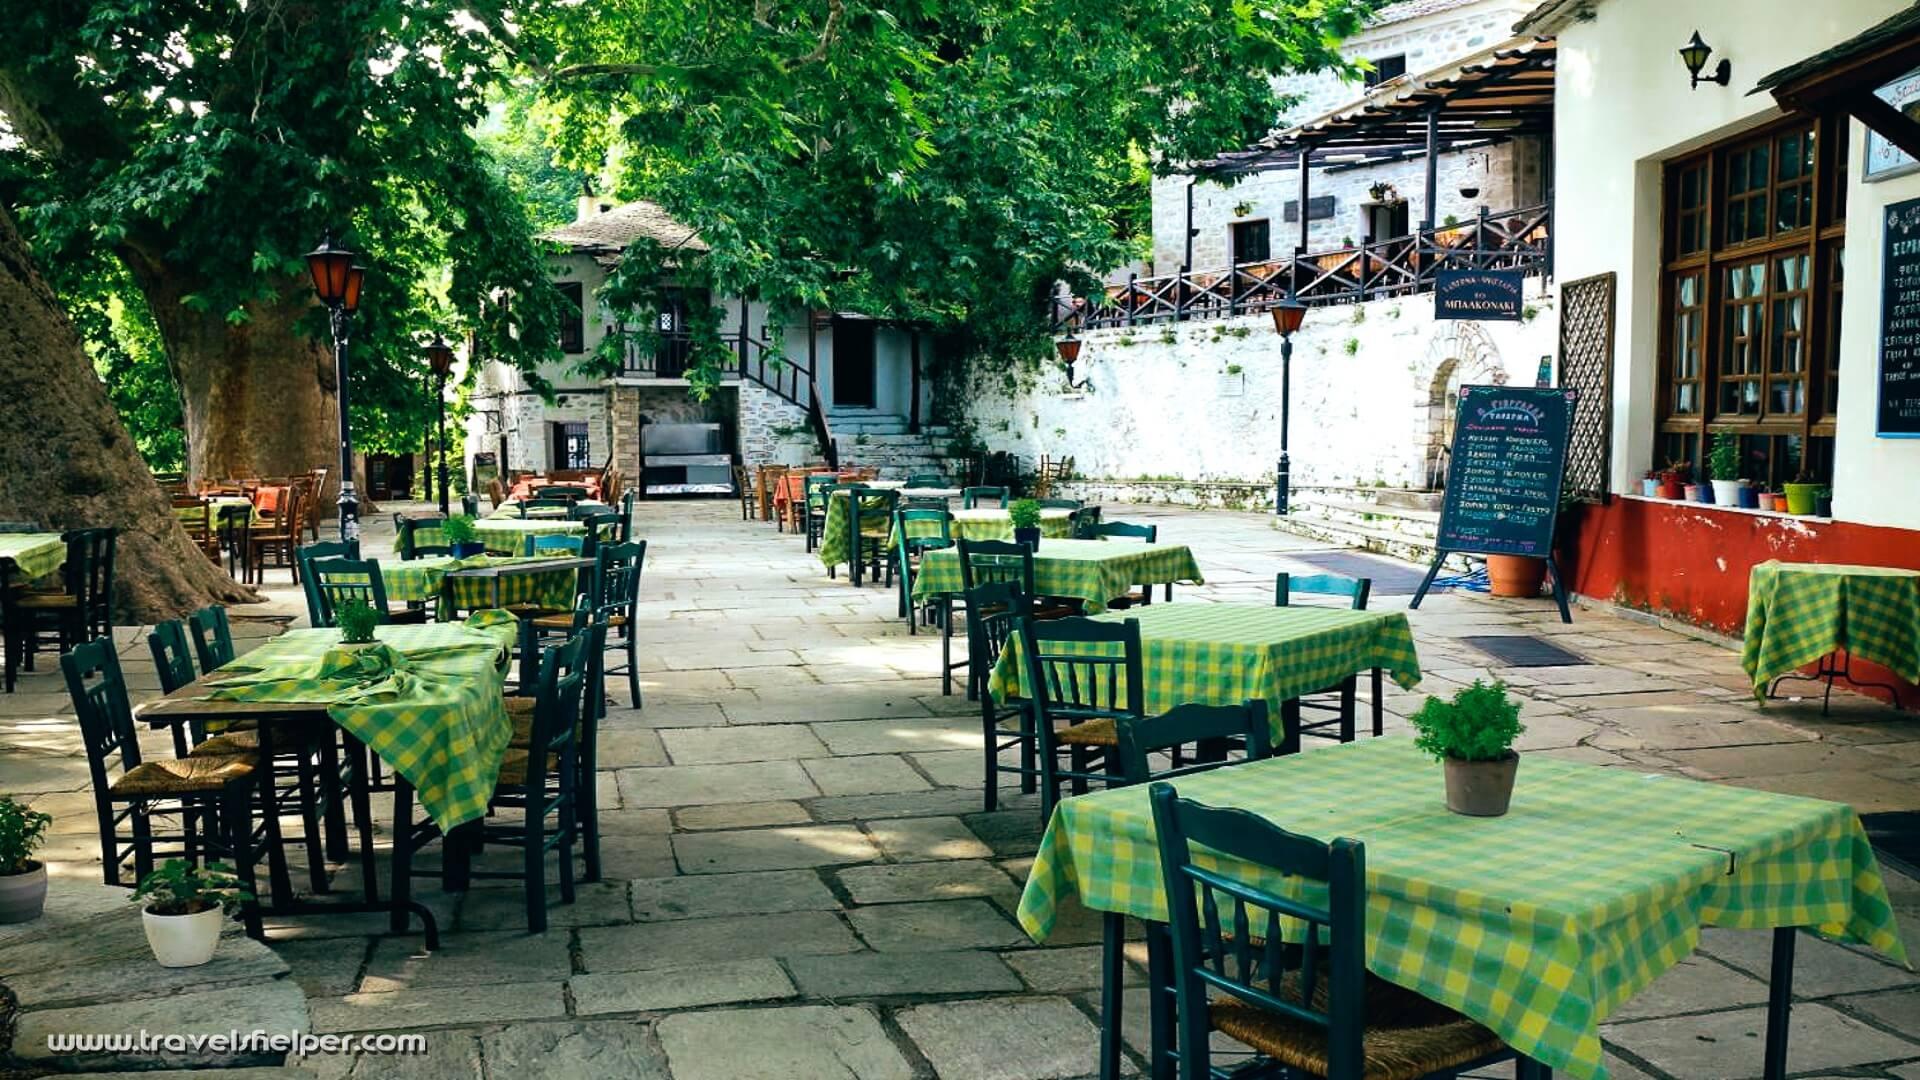 Vizitsa in Pelion, Greece